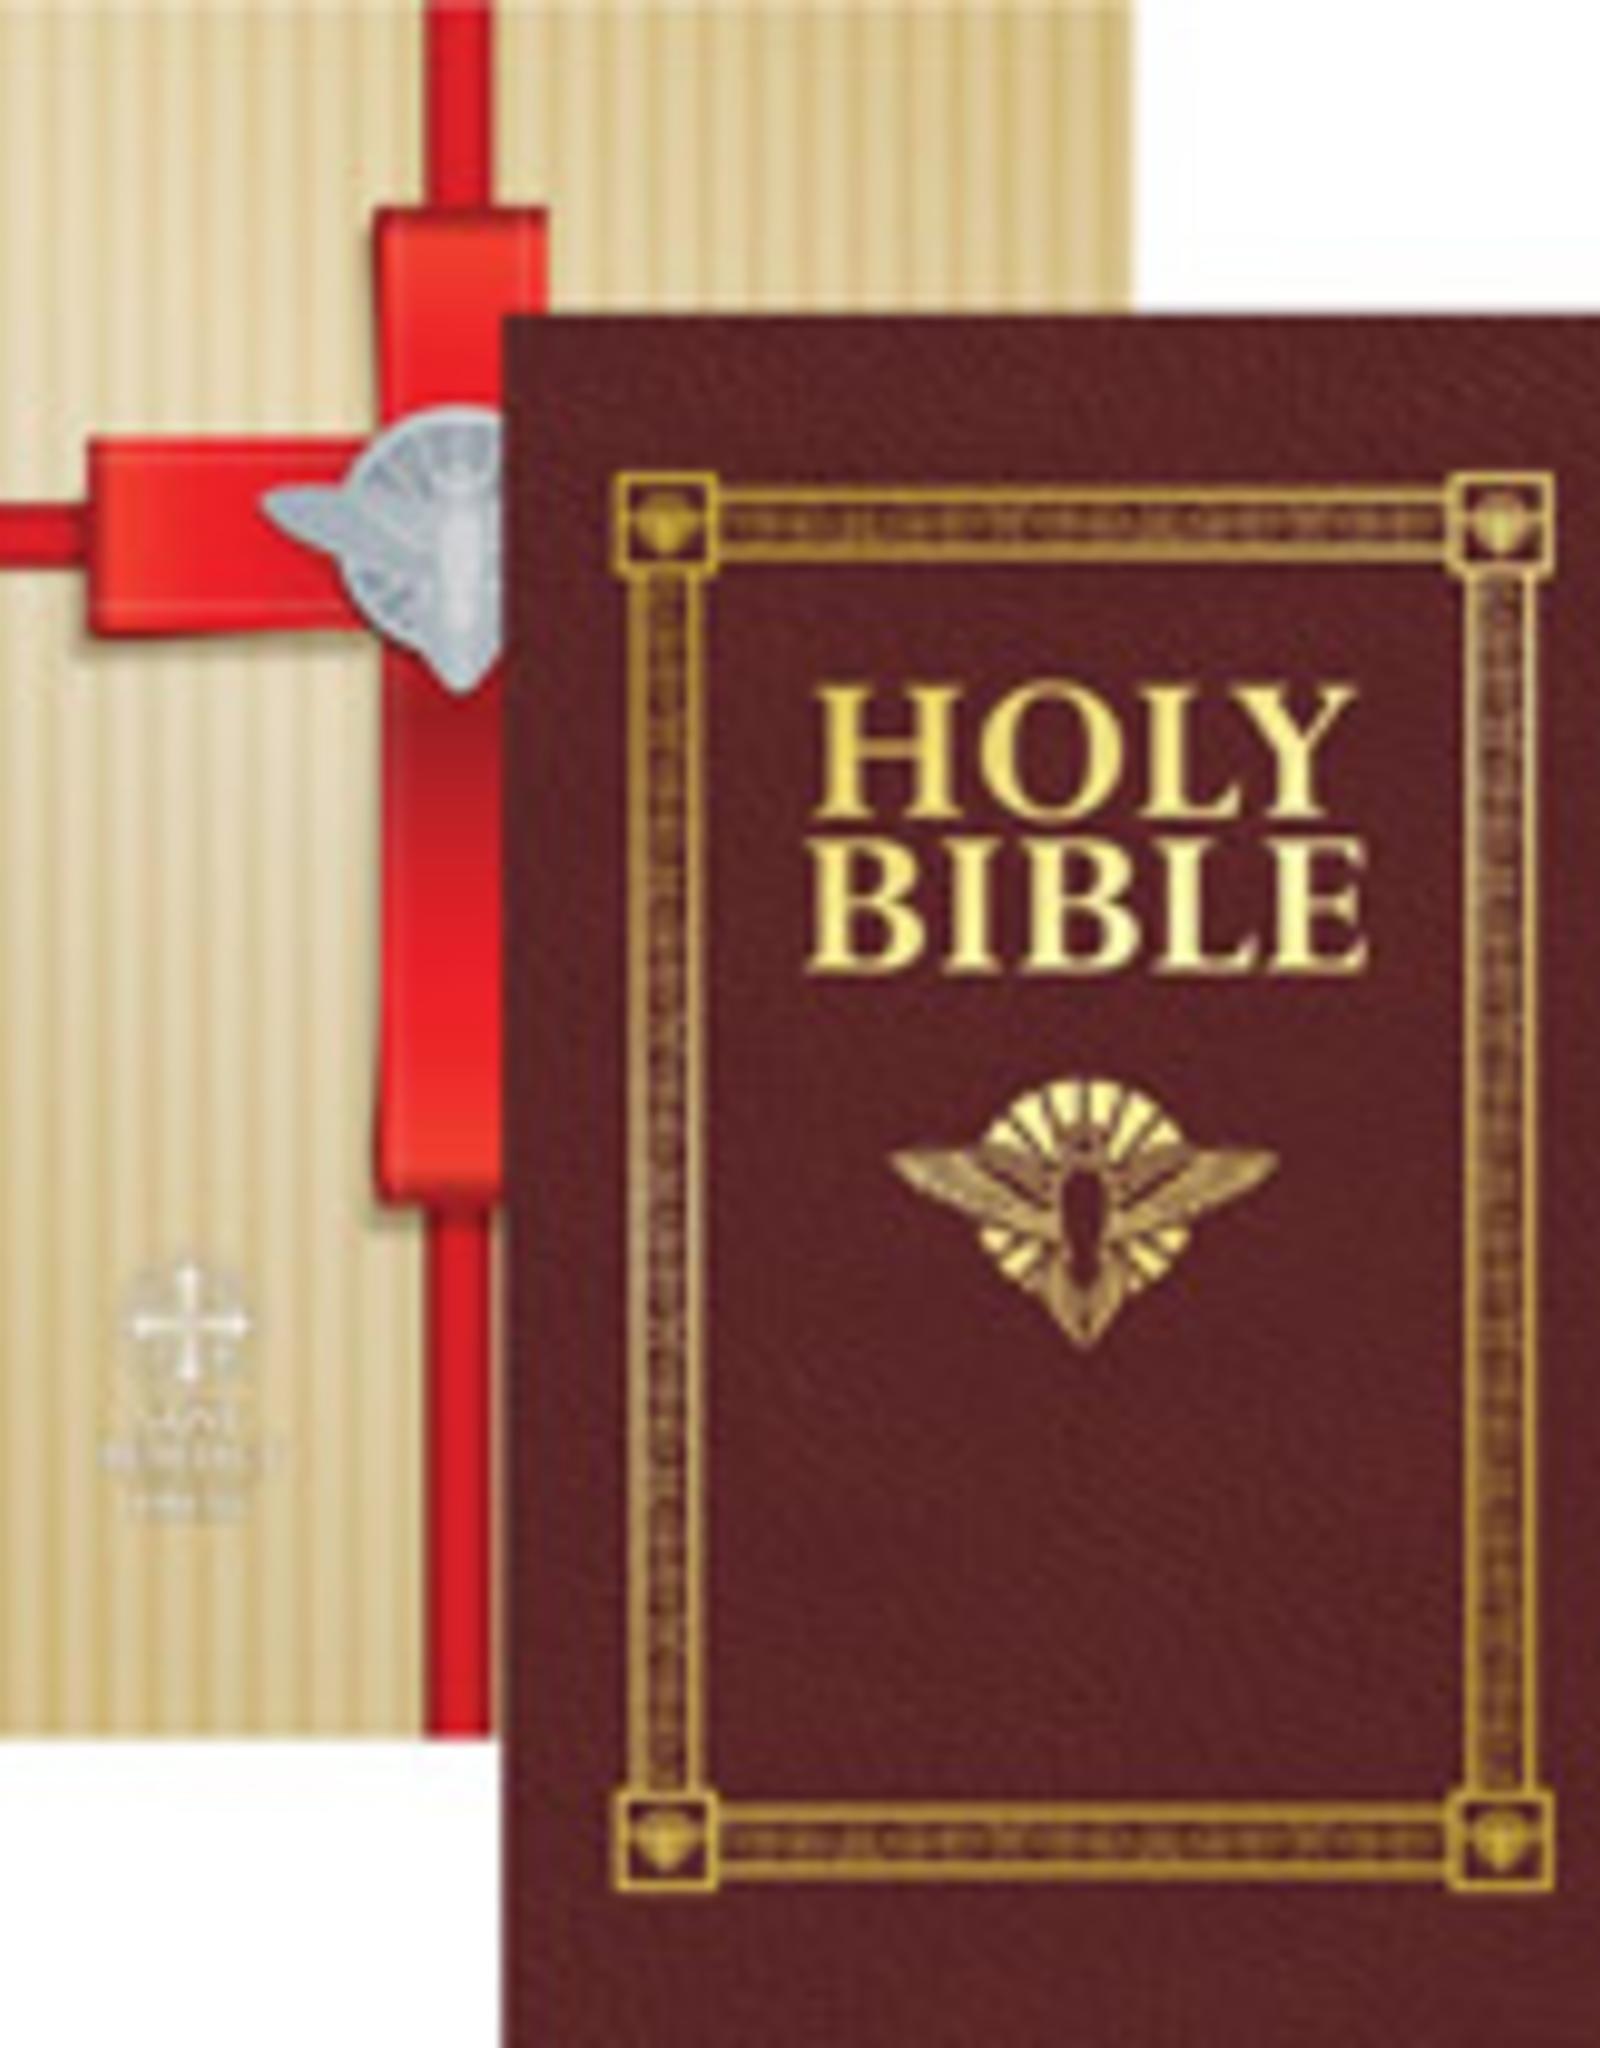 Tan Books Douay-Rheims Bible (Confirmation Gift, Hardcover)